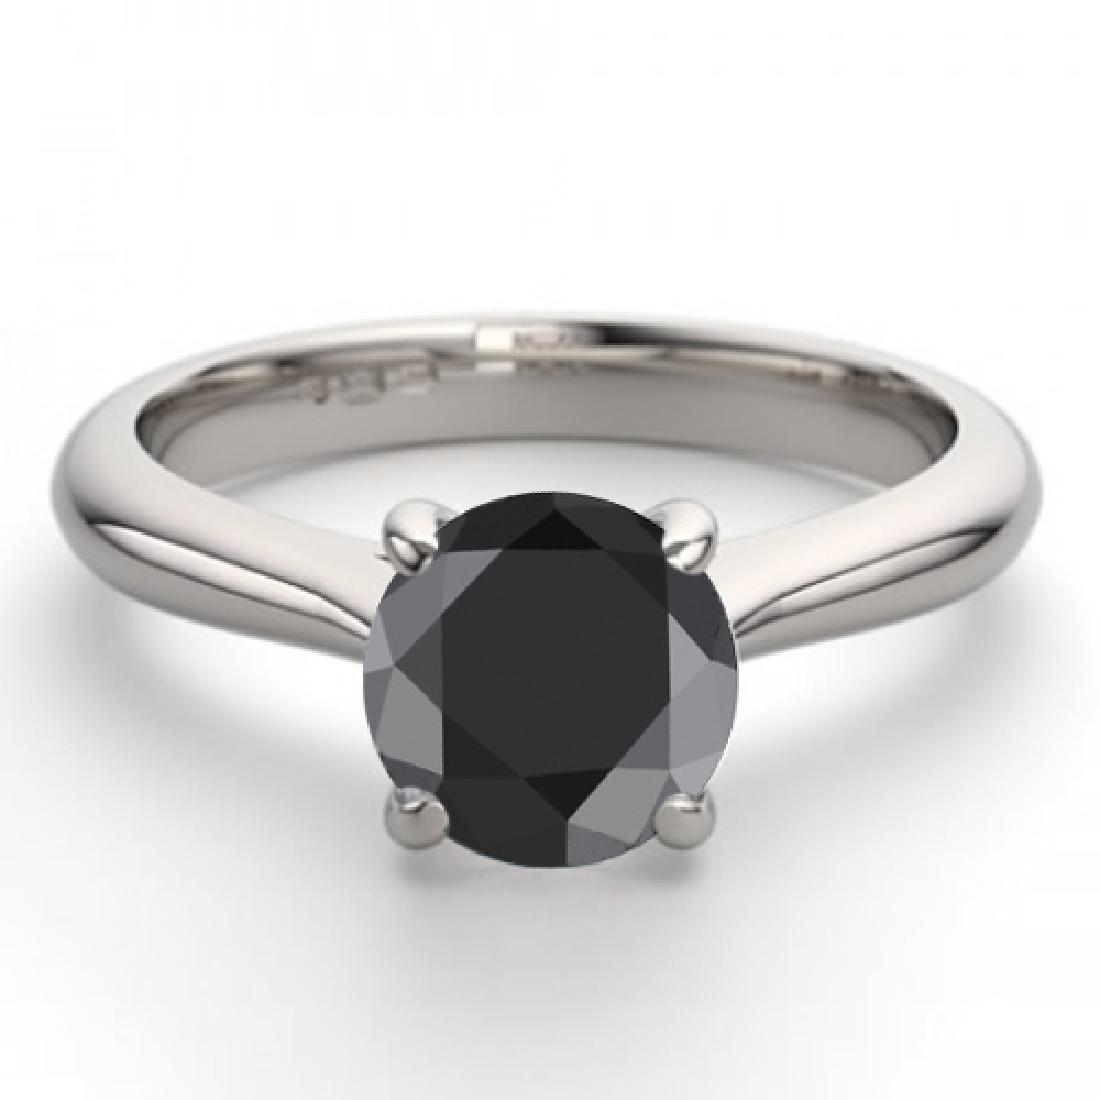 14K White Gold 1.13 ctw Black Diamond Solitaire Ring -